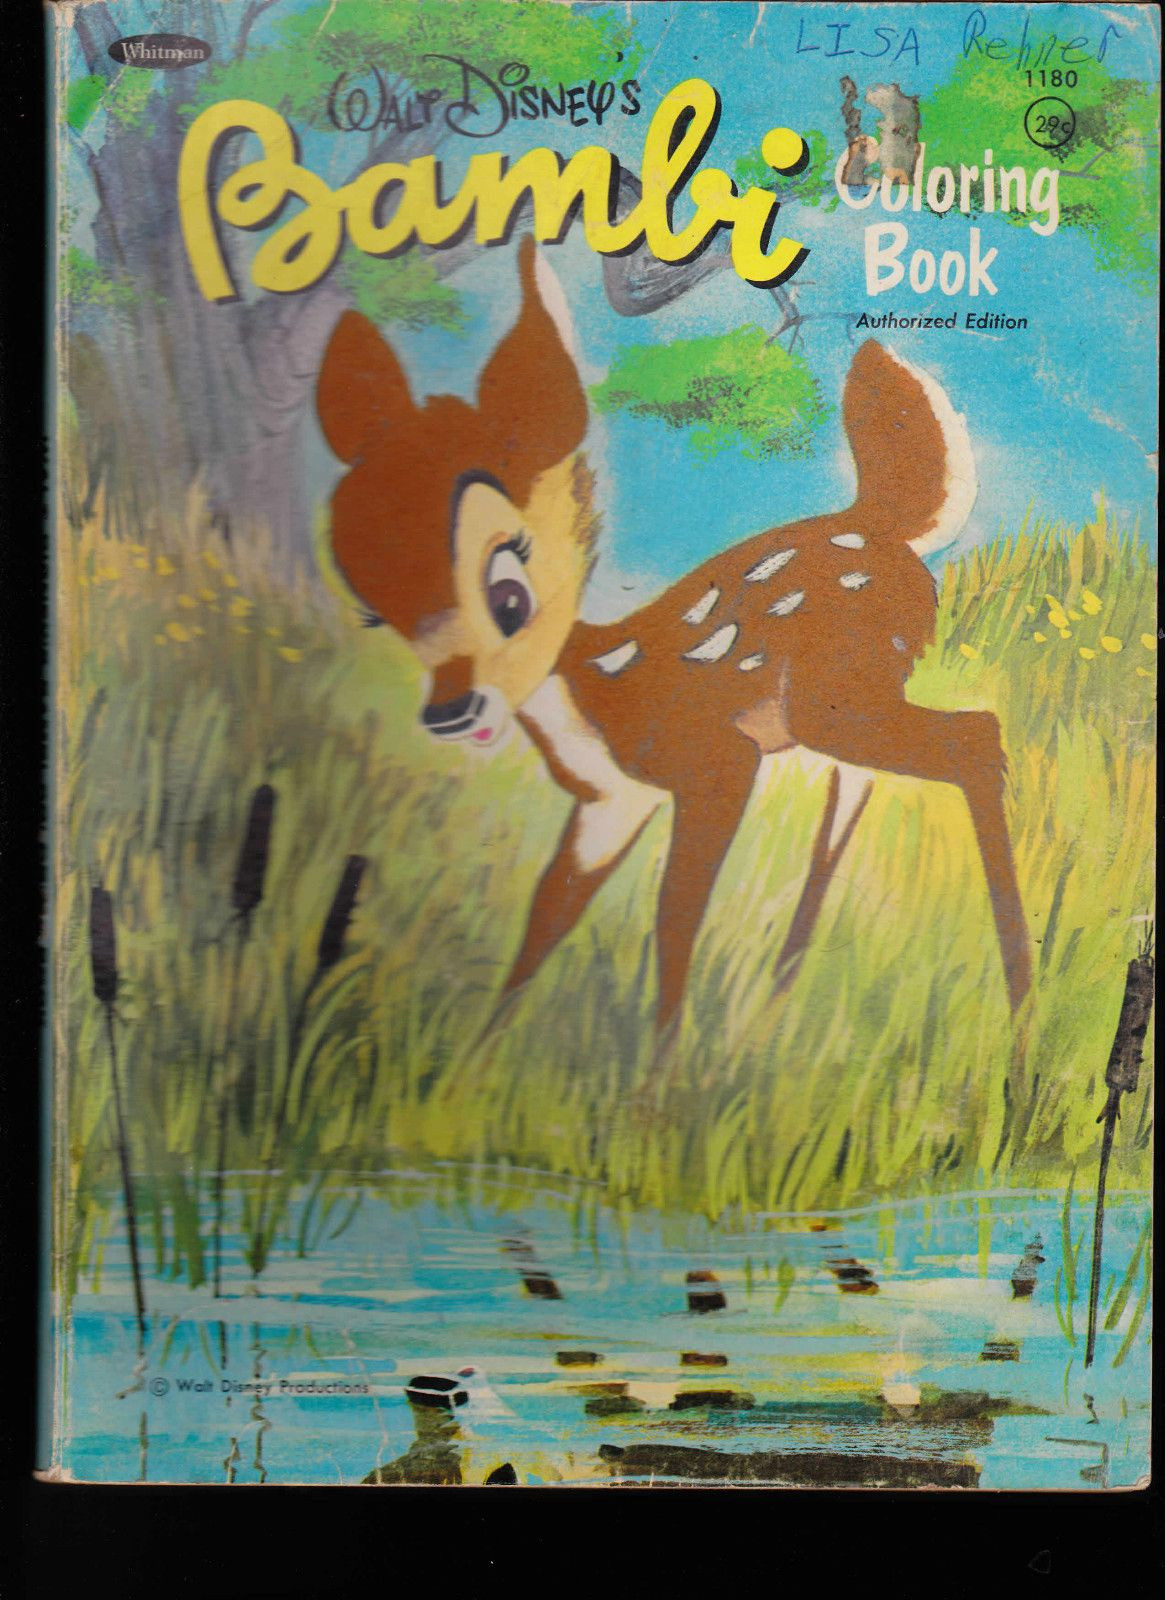 Minecraft Ausmalbilder Enderman Neu Bambi Coloring Book 1180 1960 Genial Ausmalbilder Burgen Stock